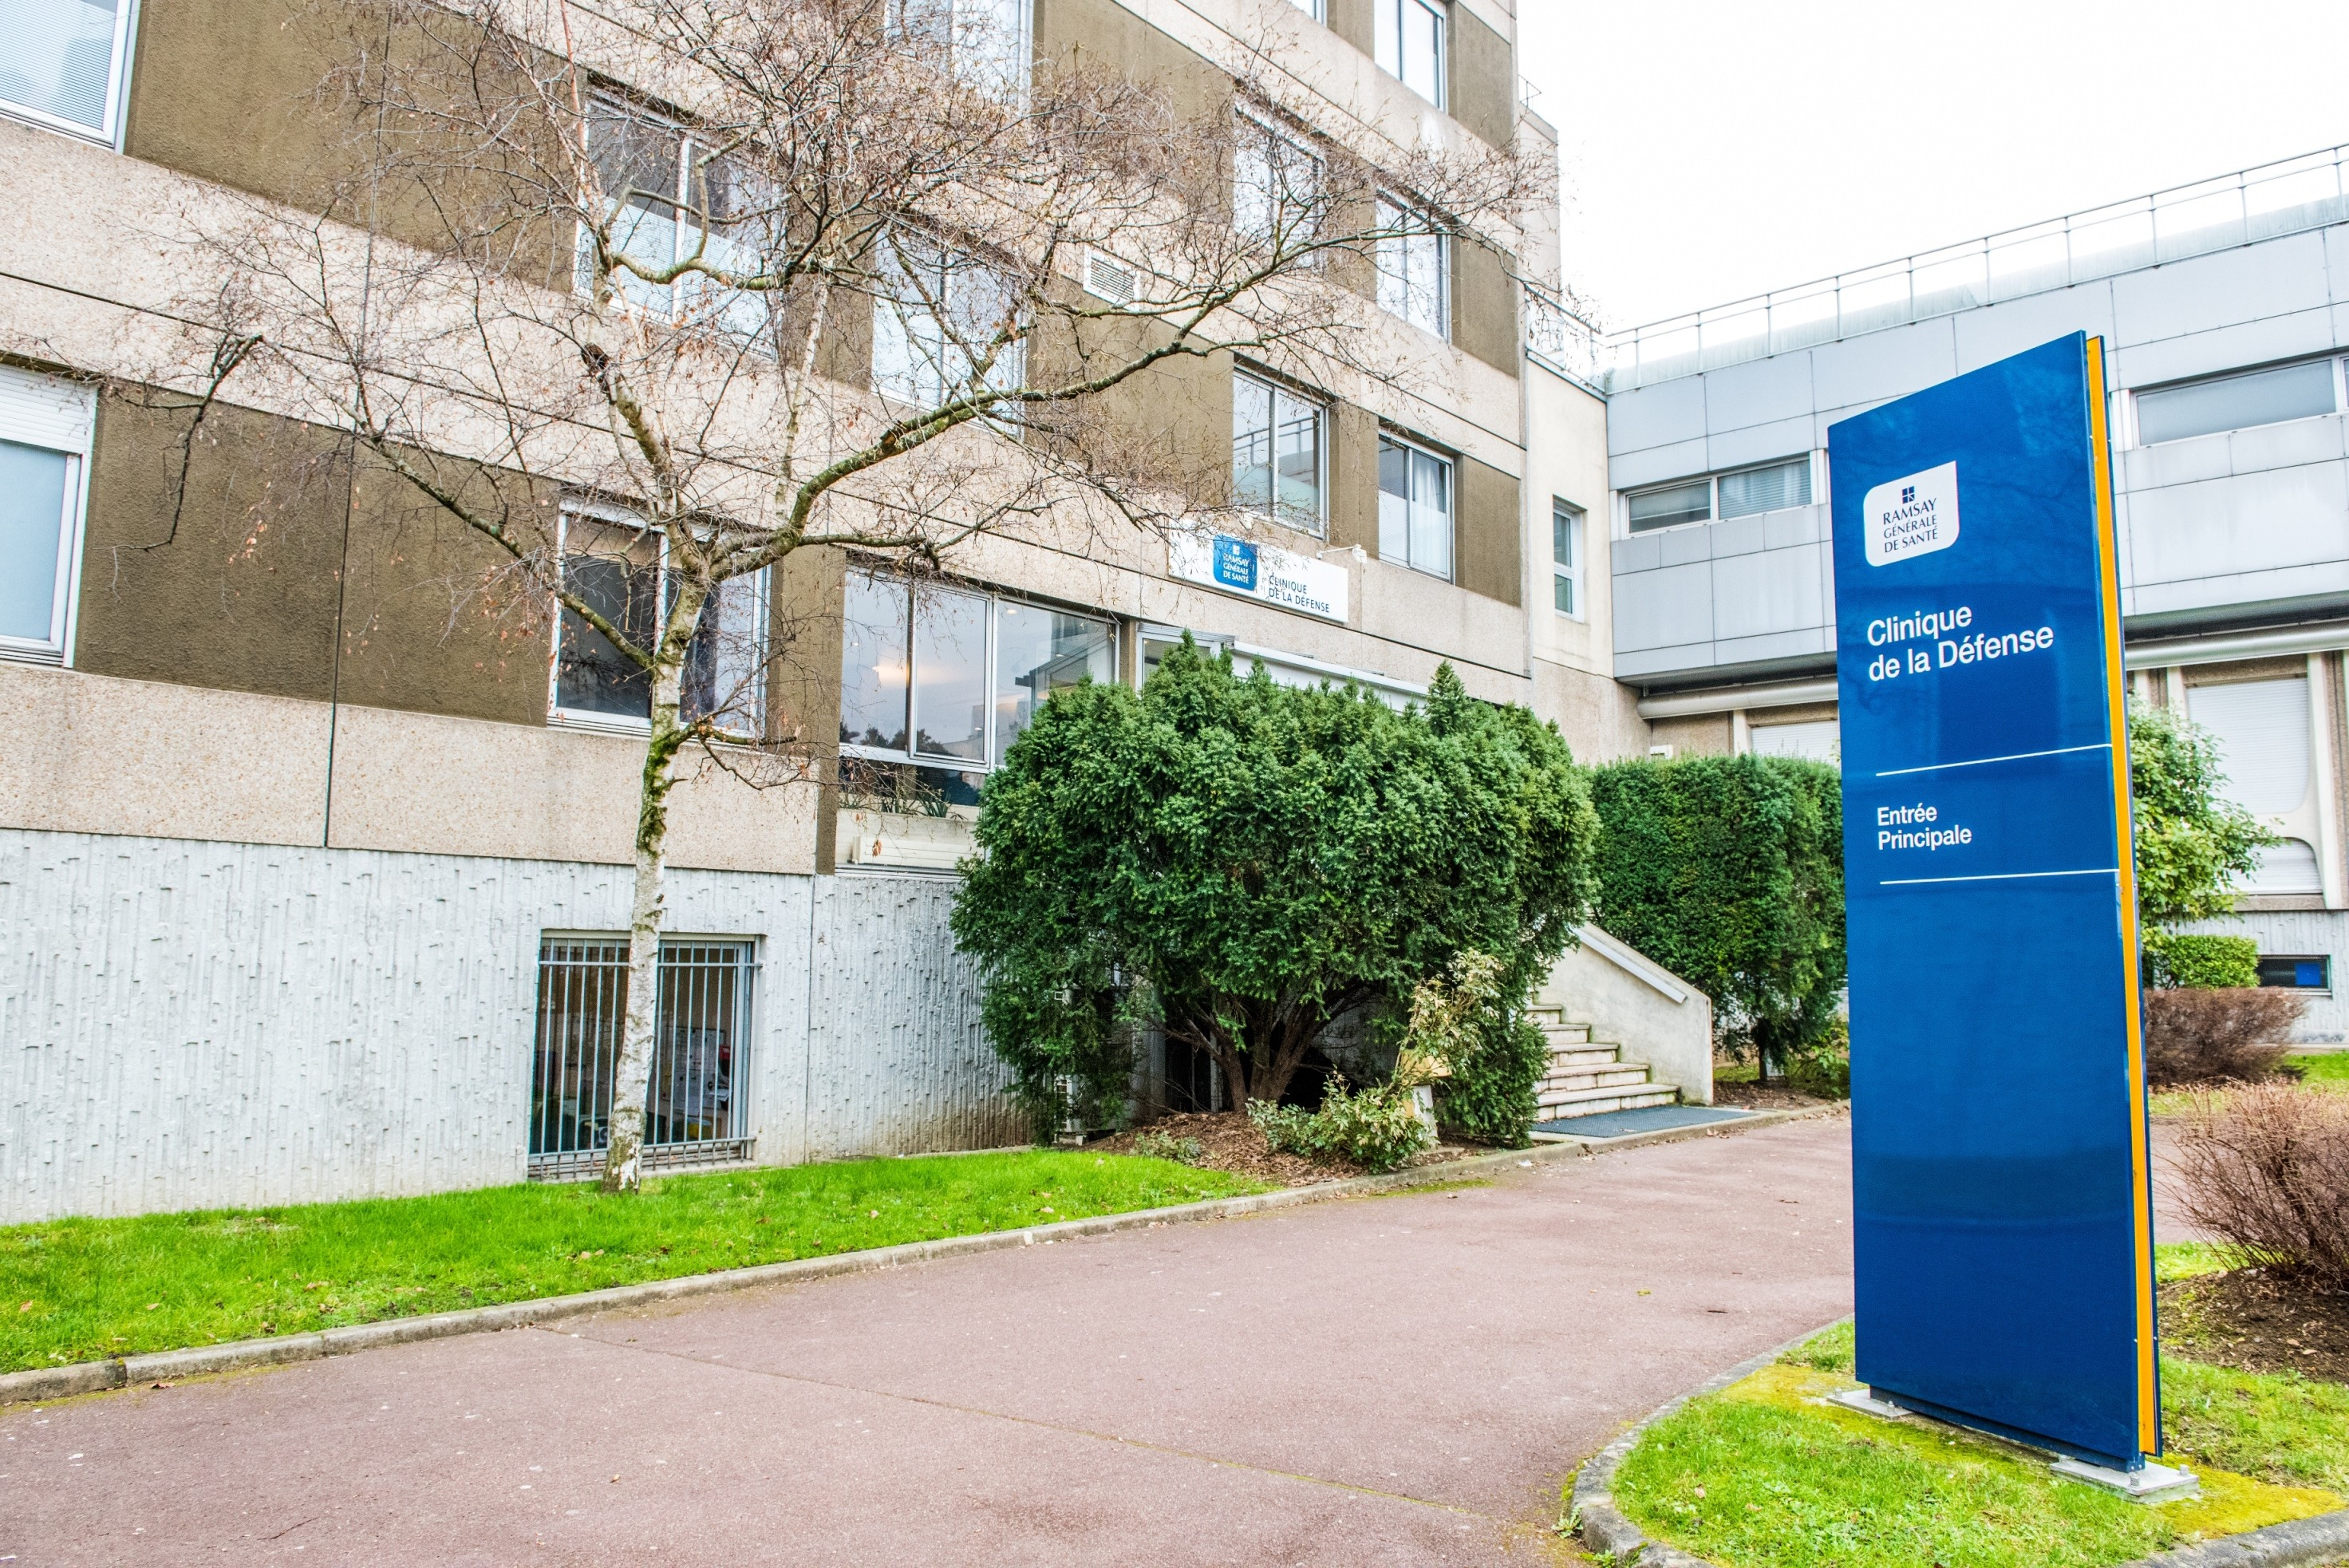 Residence Maison Blanche Lille clinique de la defense   linkedin